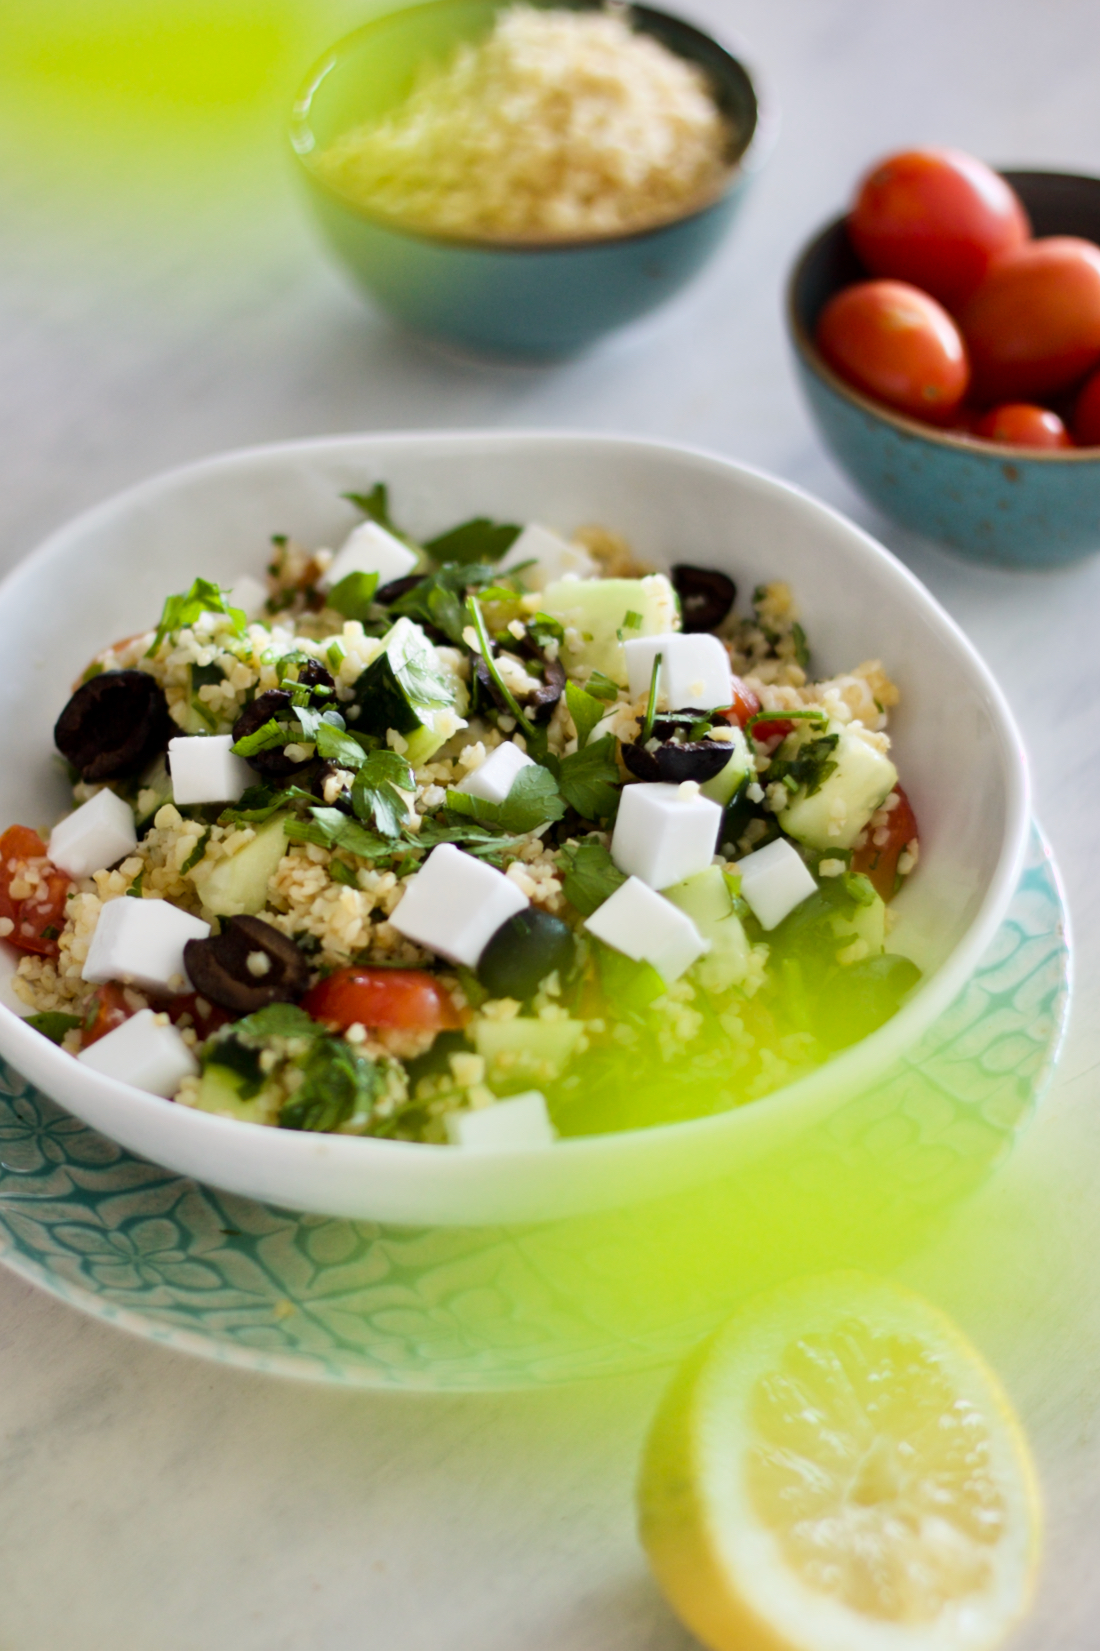 bulgur-feta-olives-salad-salada-azeitonas-mediterrânica-5